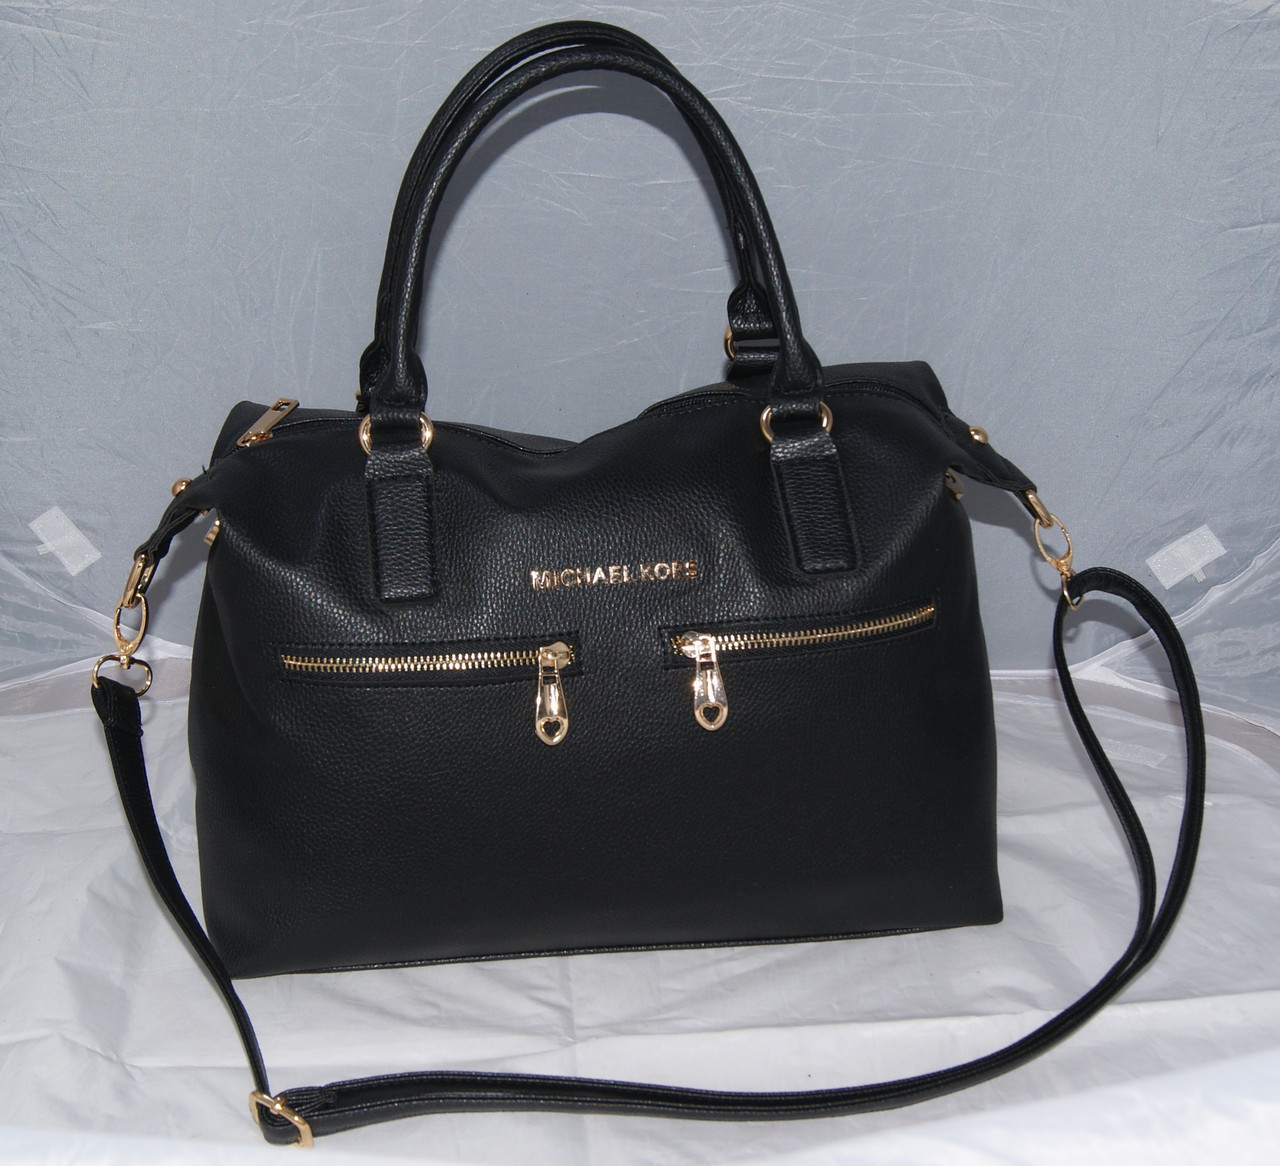 ce32cb6064c4 Черная женская сумка Michael Kors, Майкл Корс, MK, цена 545 грн .